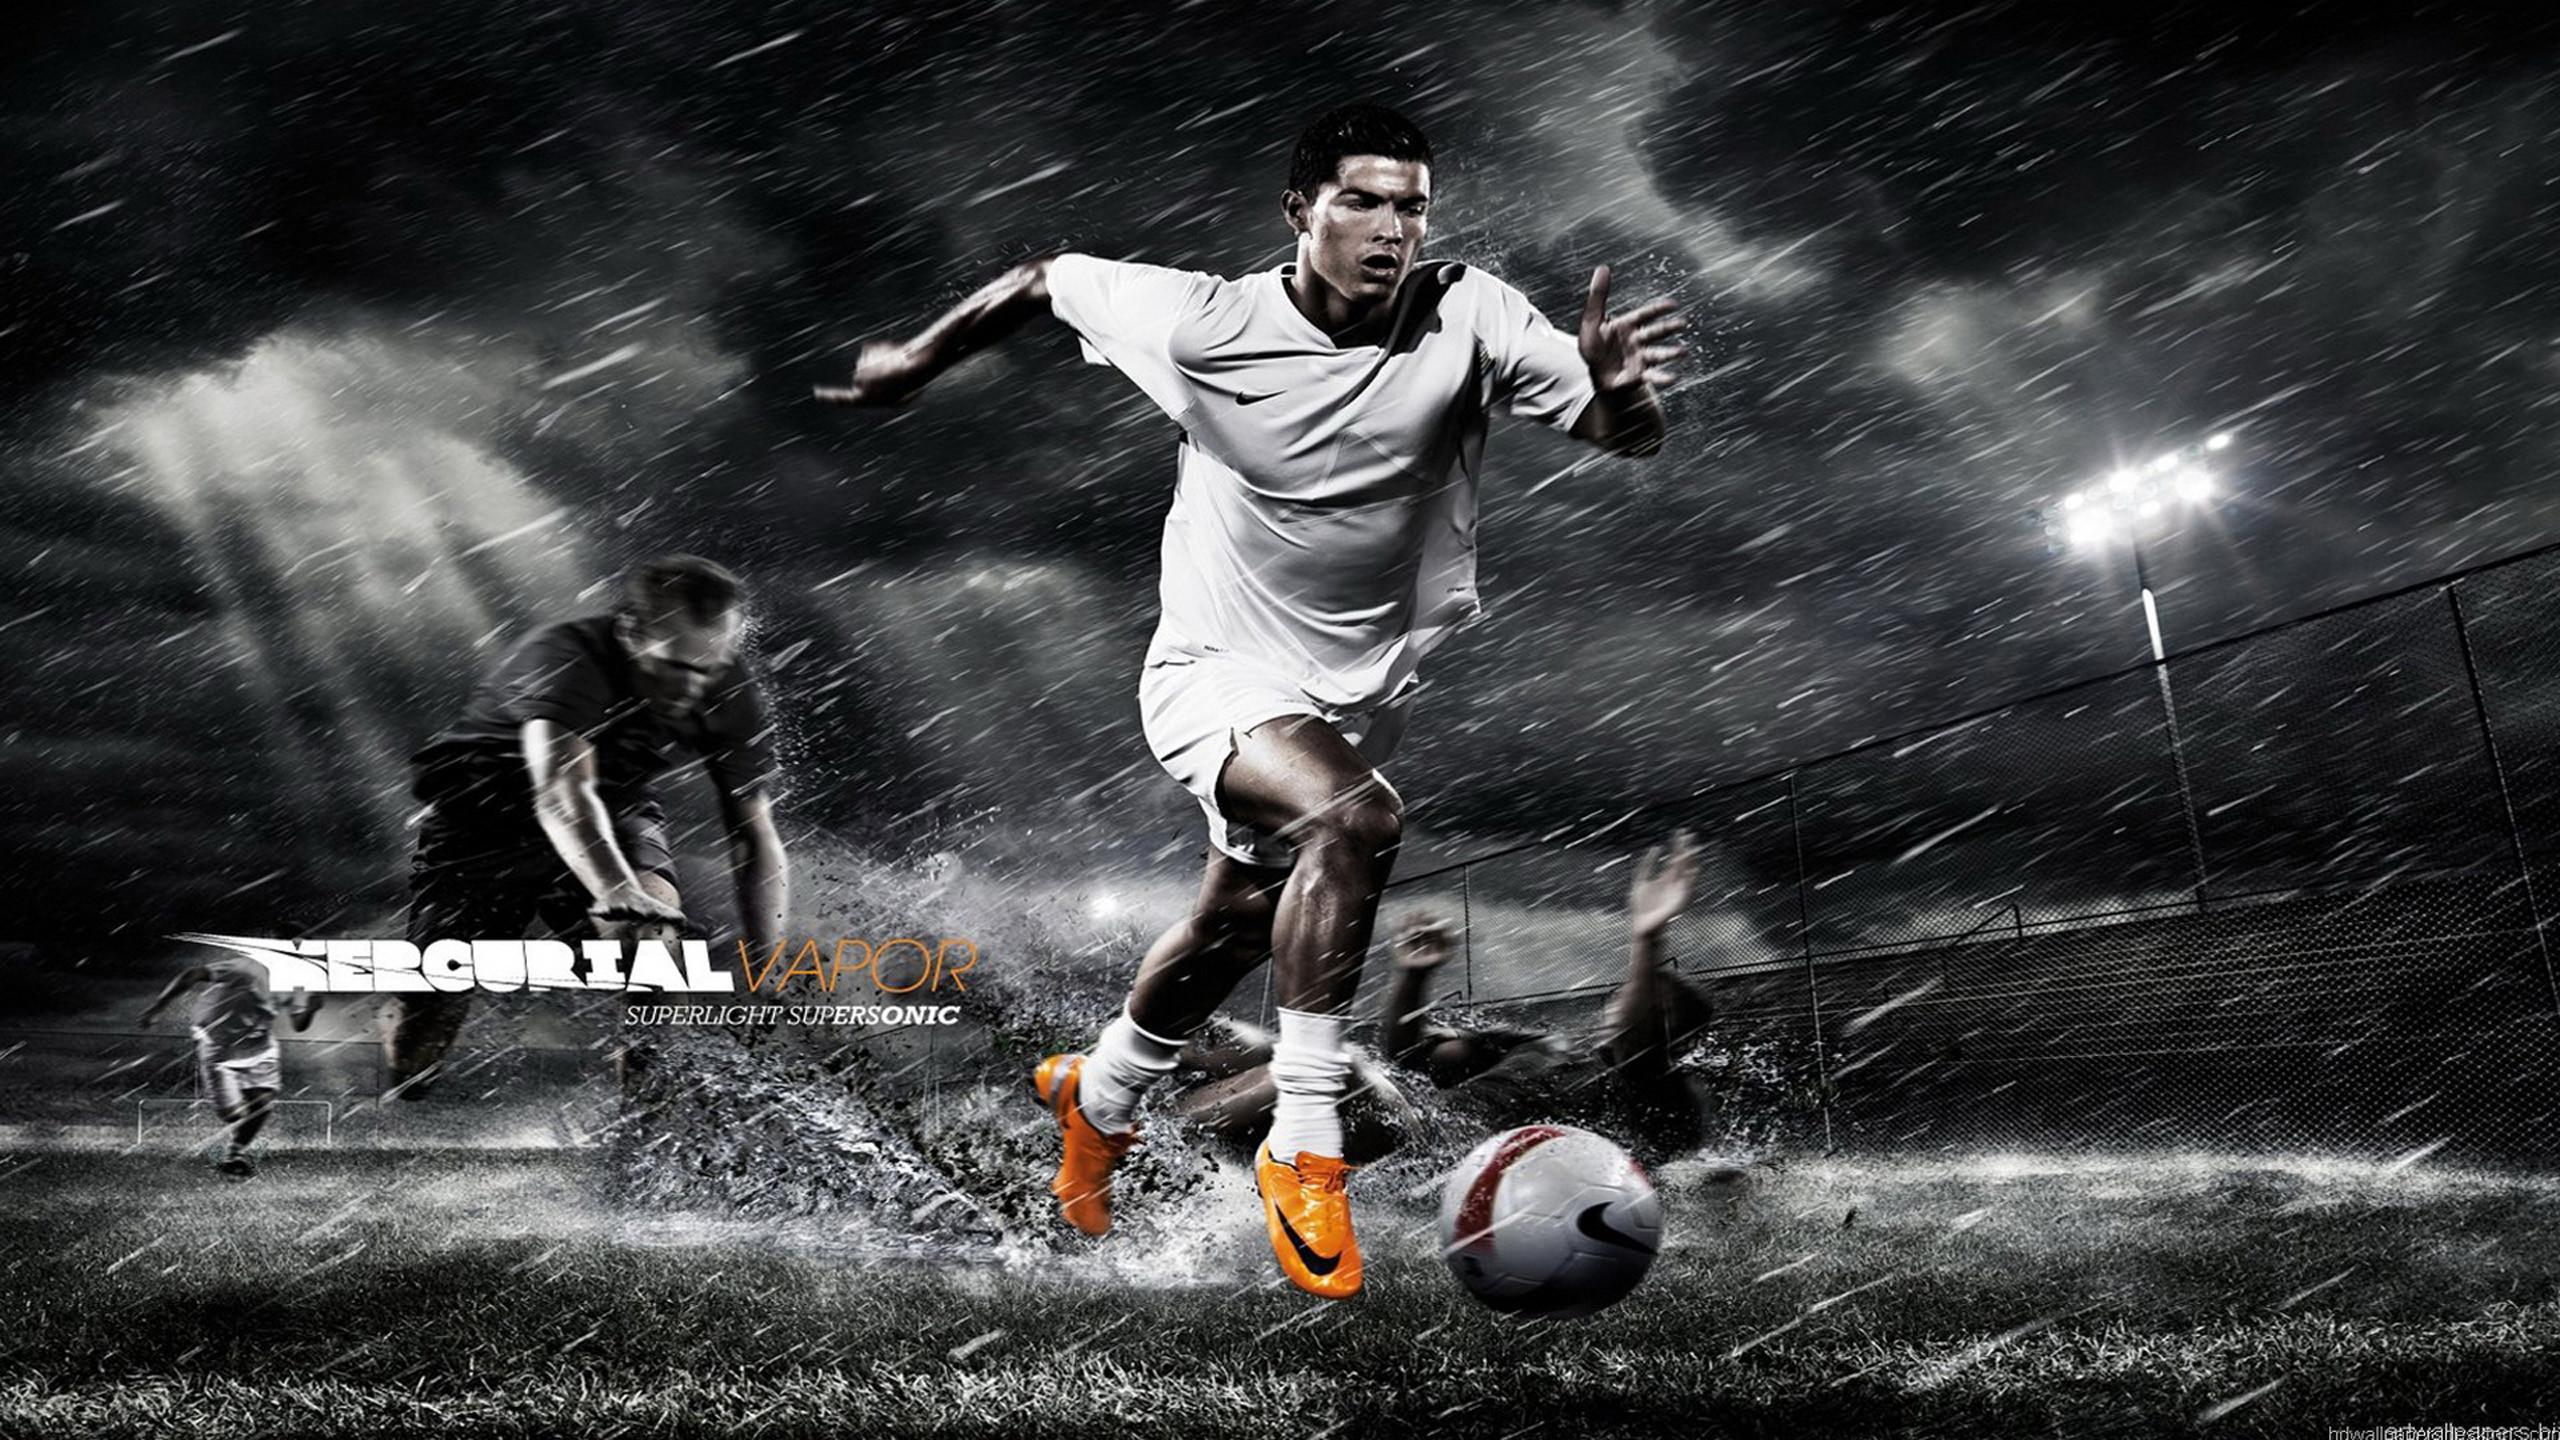 Football Wallpapers HD Wallpaper | HD Wallpapers | Pinterest | Football  wallpaper, Hd wallpaper and Wallpaper